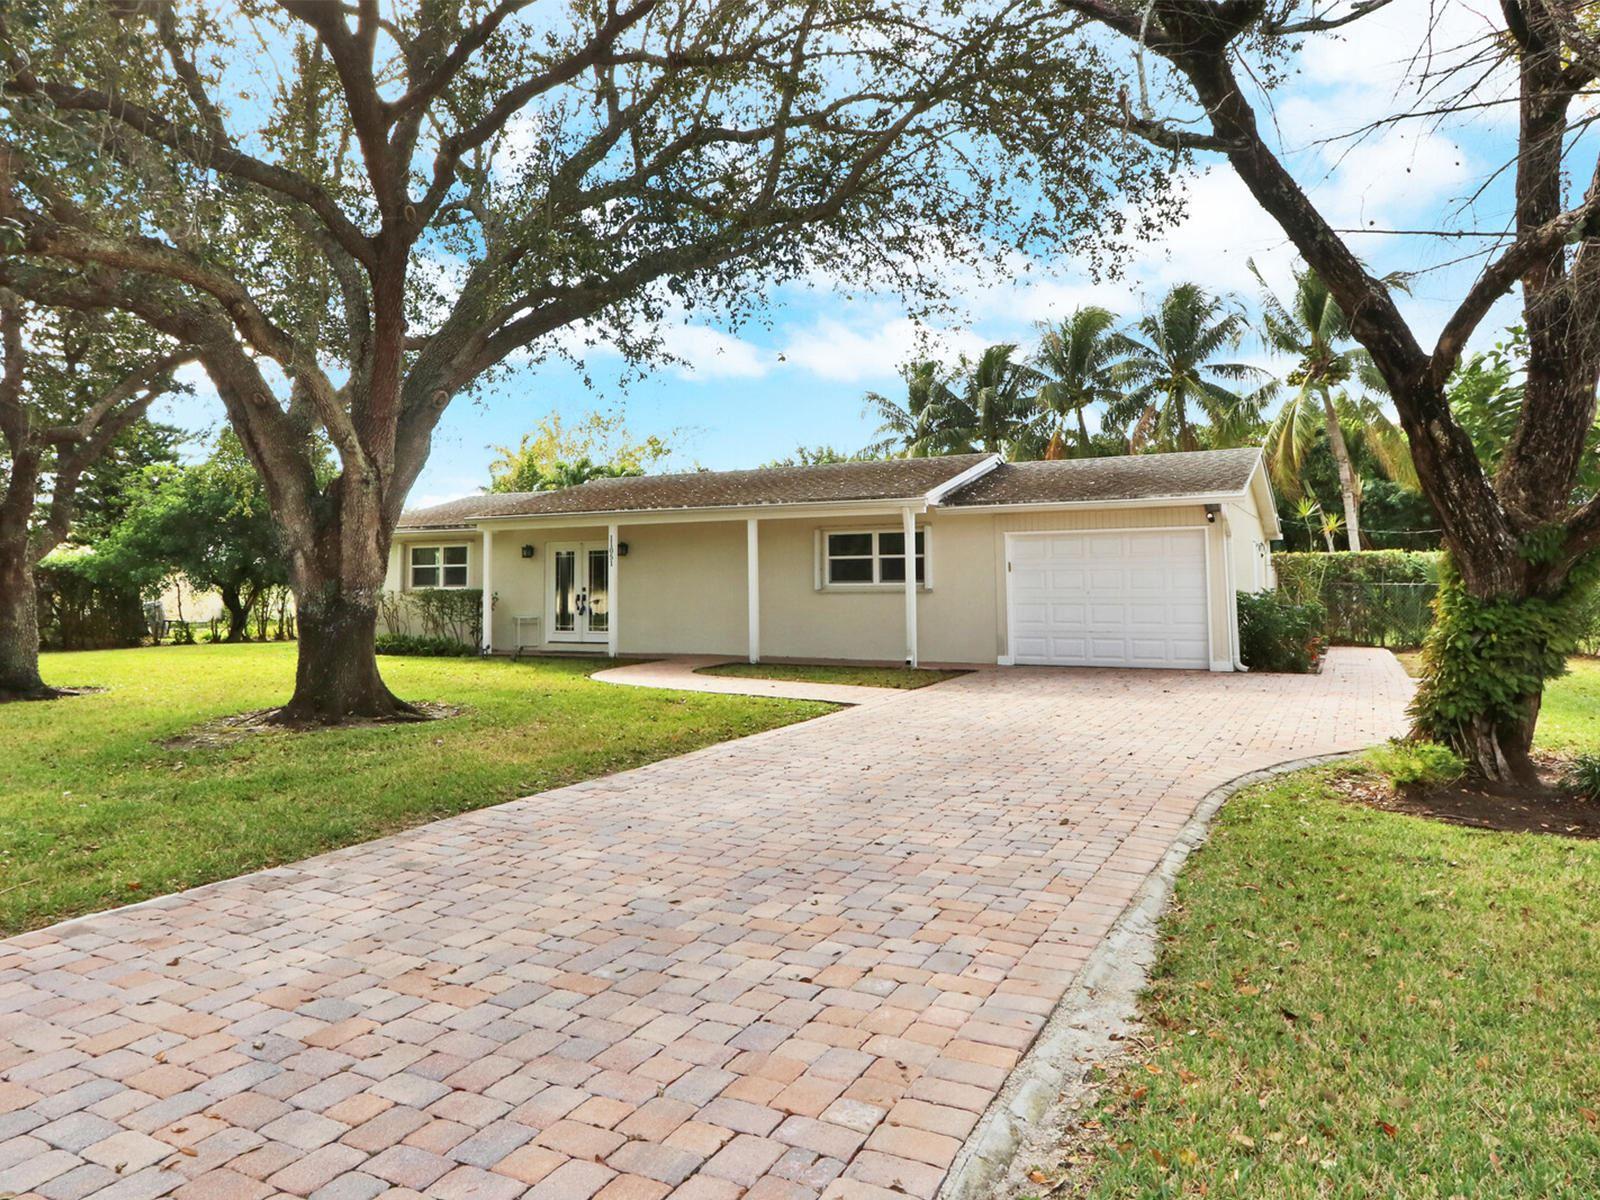 11051 Monet Terrace, Palm Beach Gardens, FL 33410 - #: RX-10683064